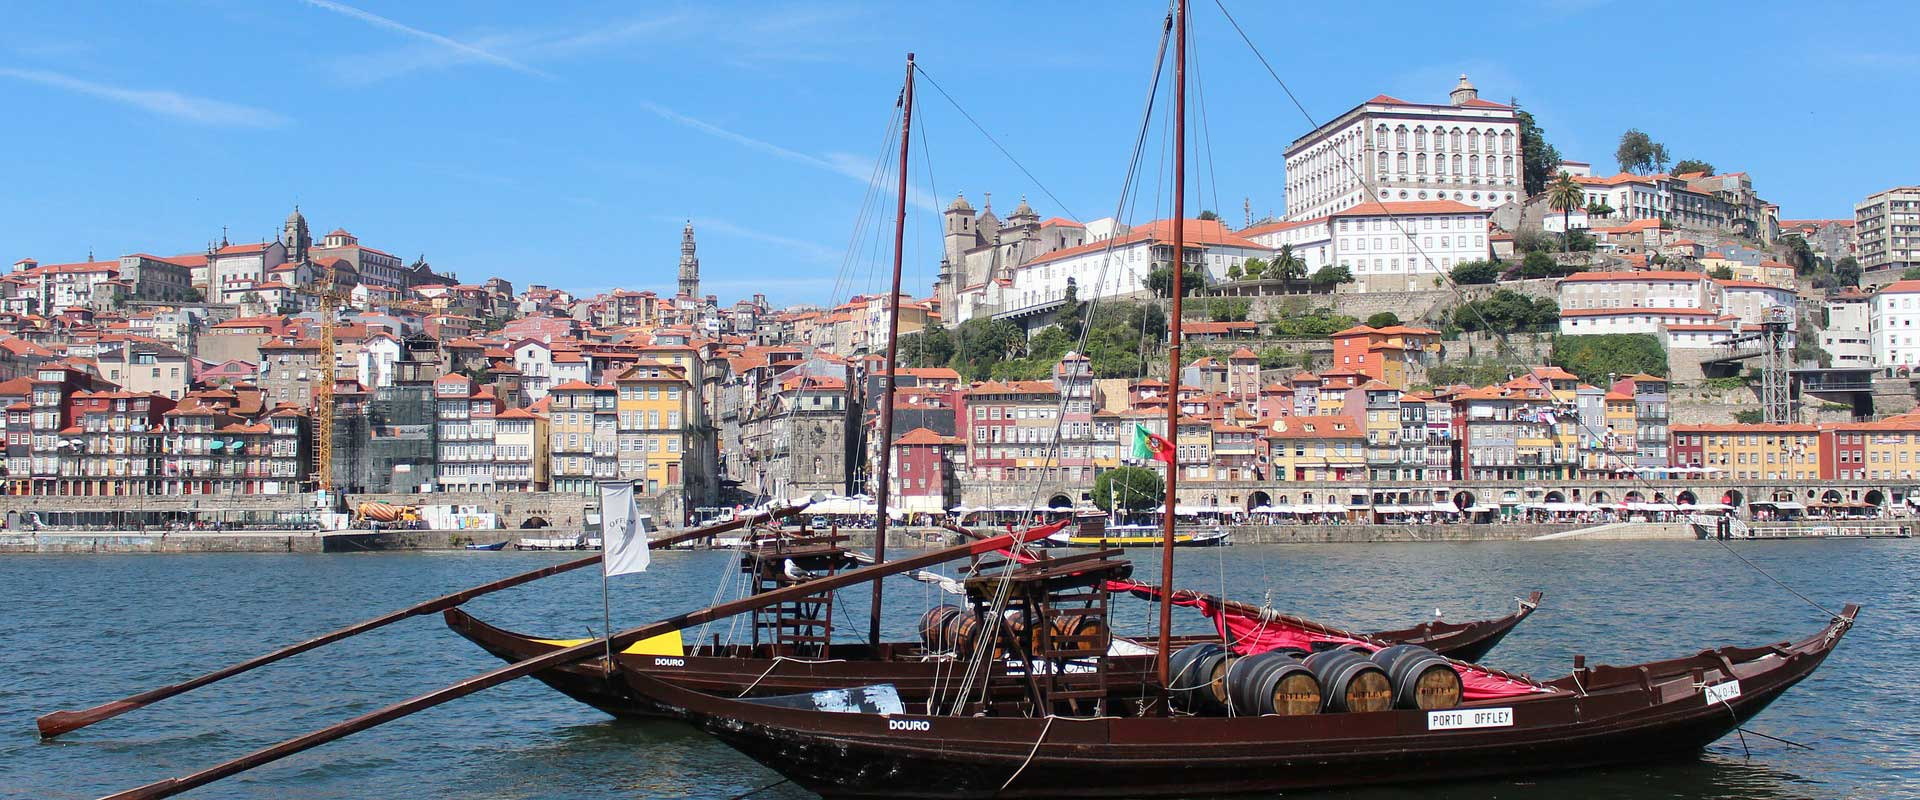 Boat Rabelo Douro Cruise Porto